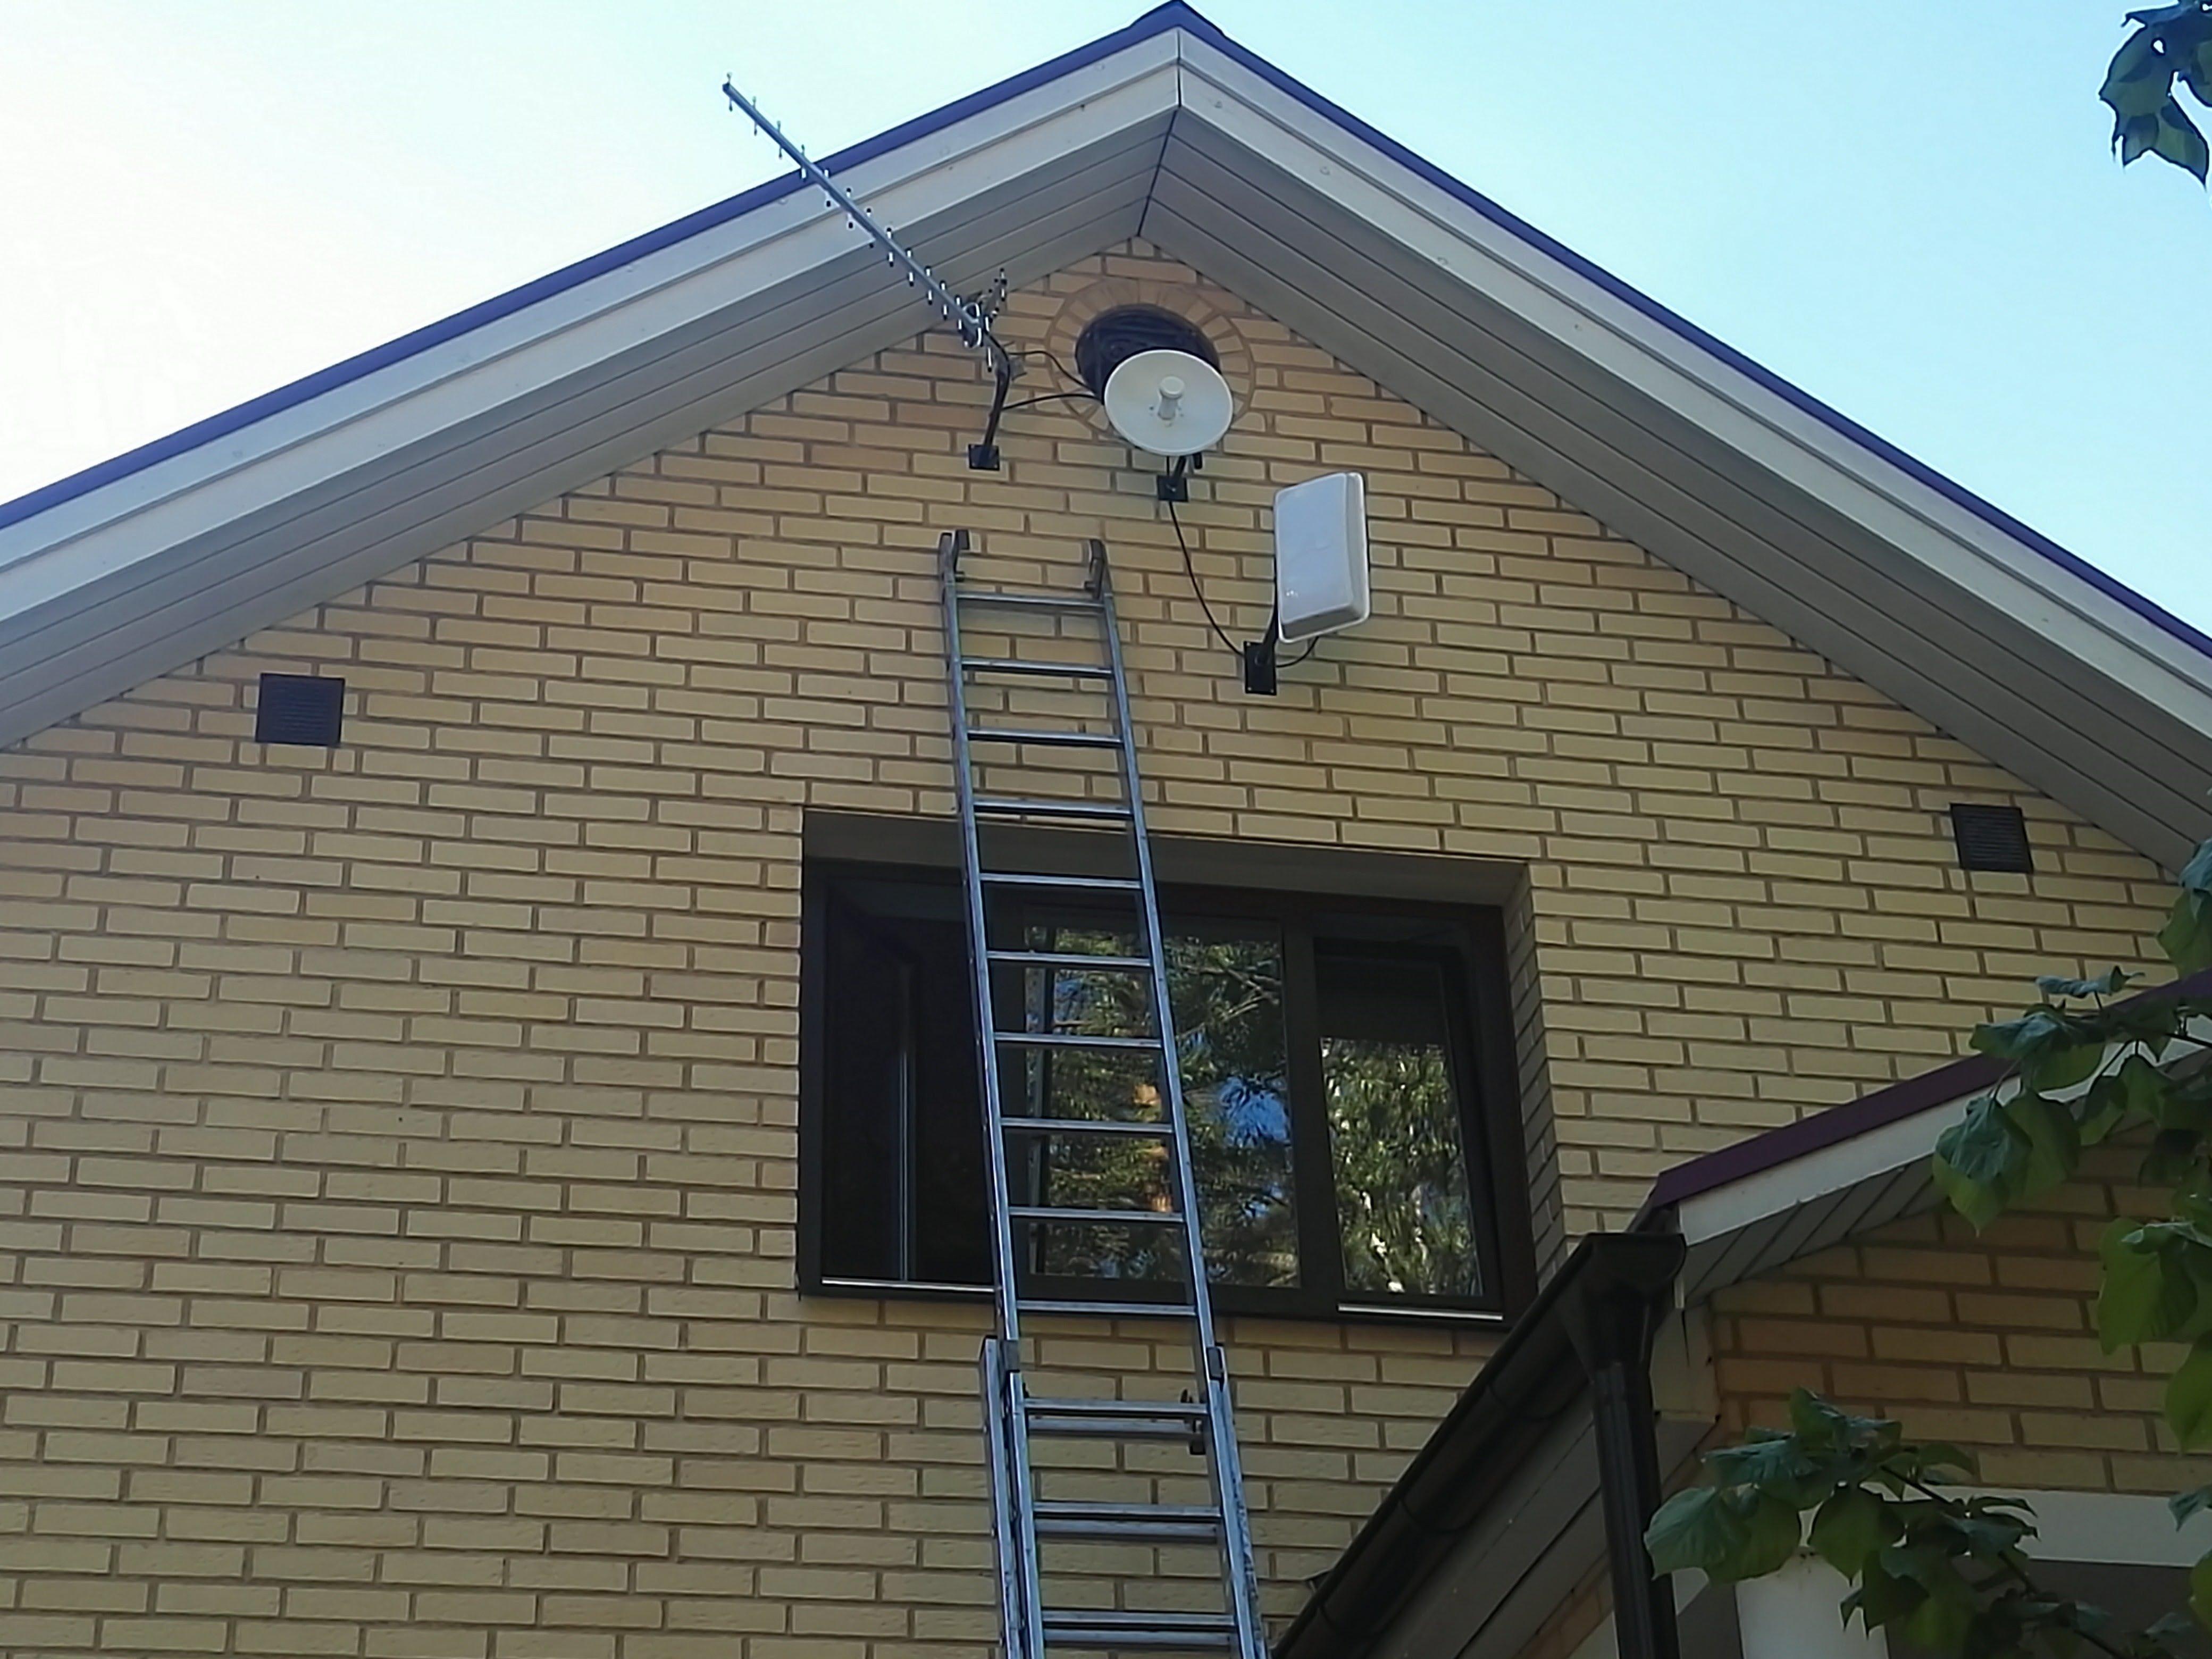 Монтаж антенны GSM 900 MediaWave MWA-9-Y18 на стене кирпичного дома